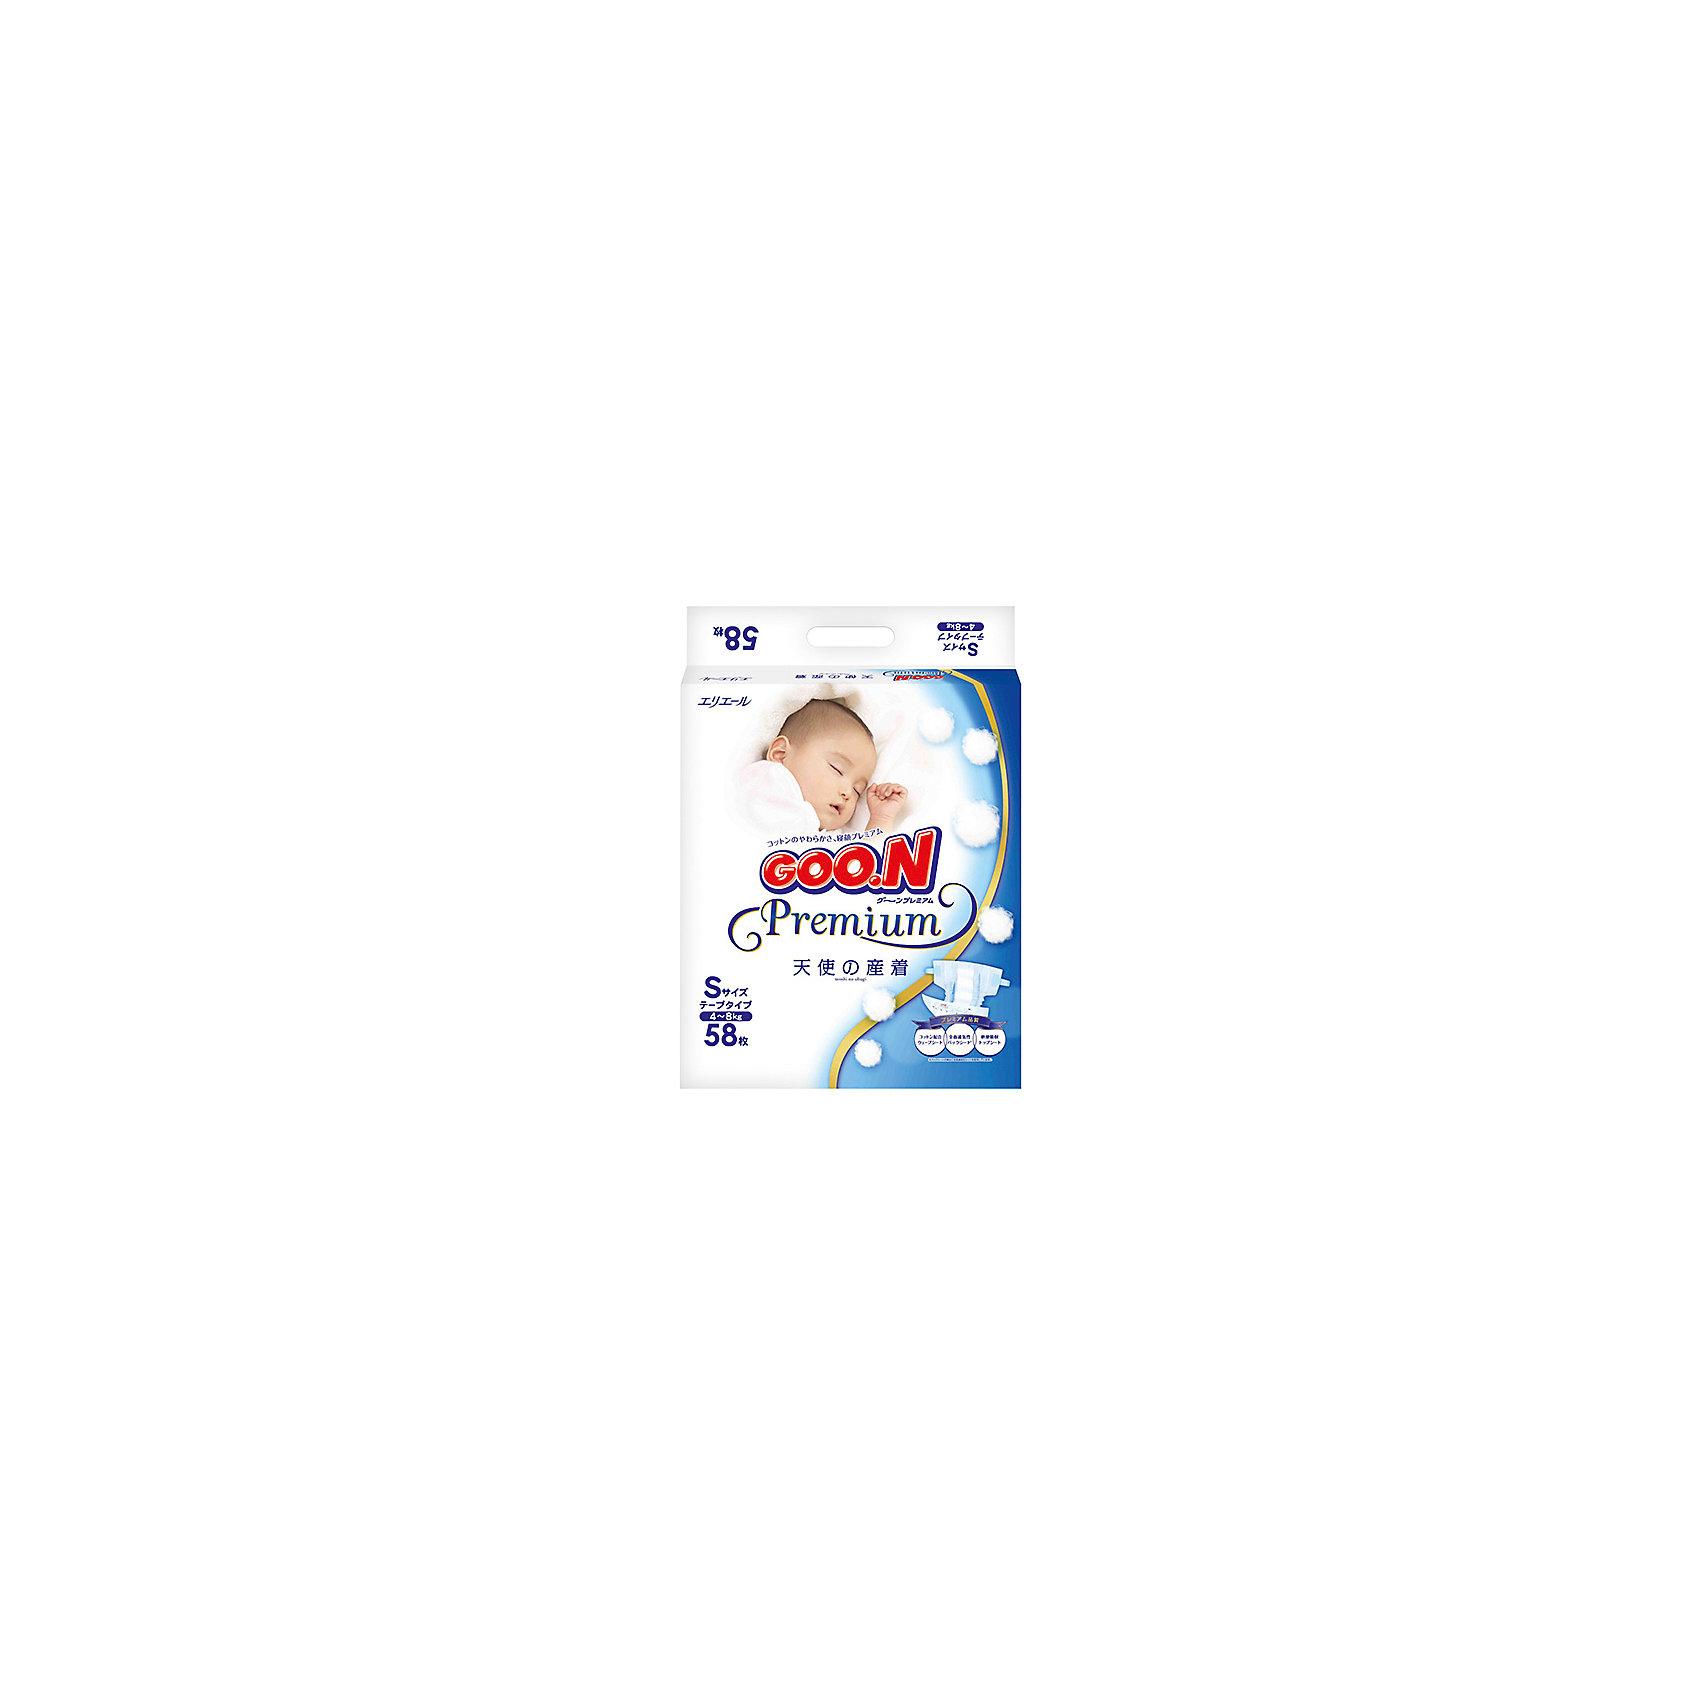 Подгузники Goon Premium, S 4-8 кг, 58шт